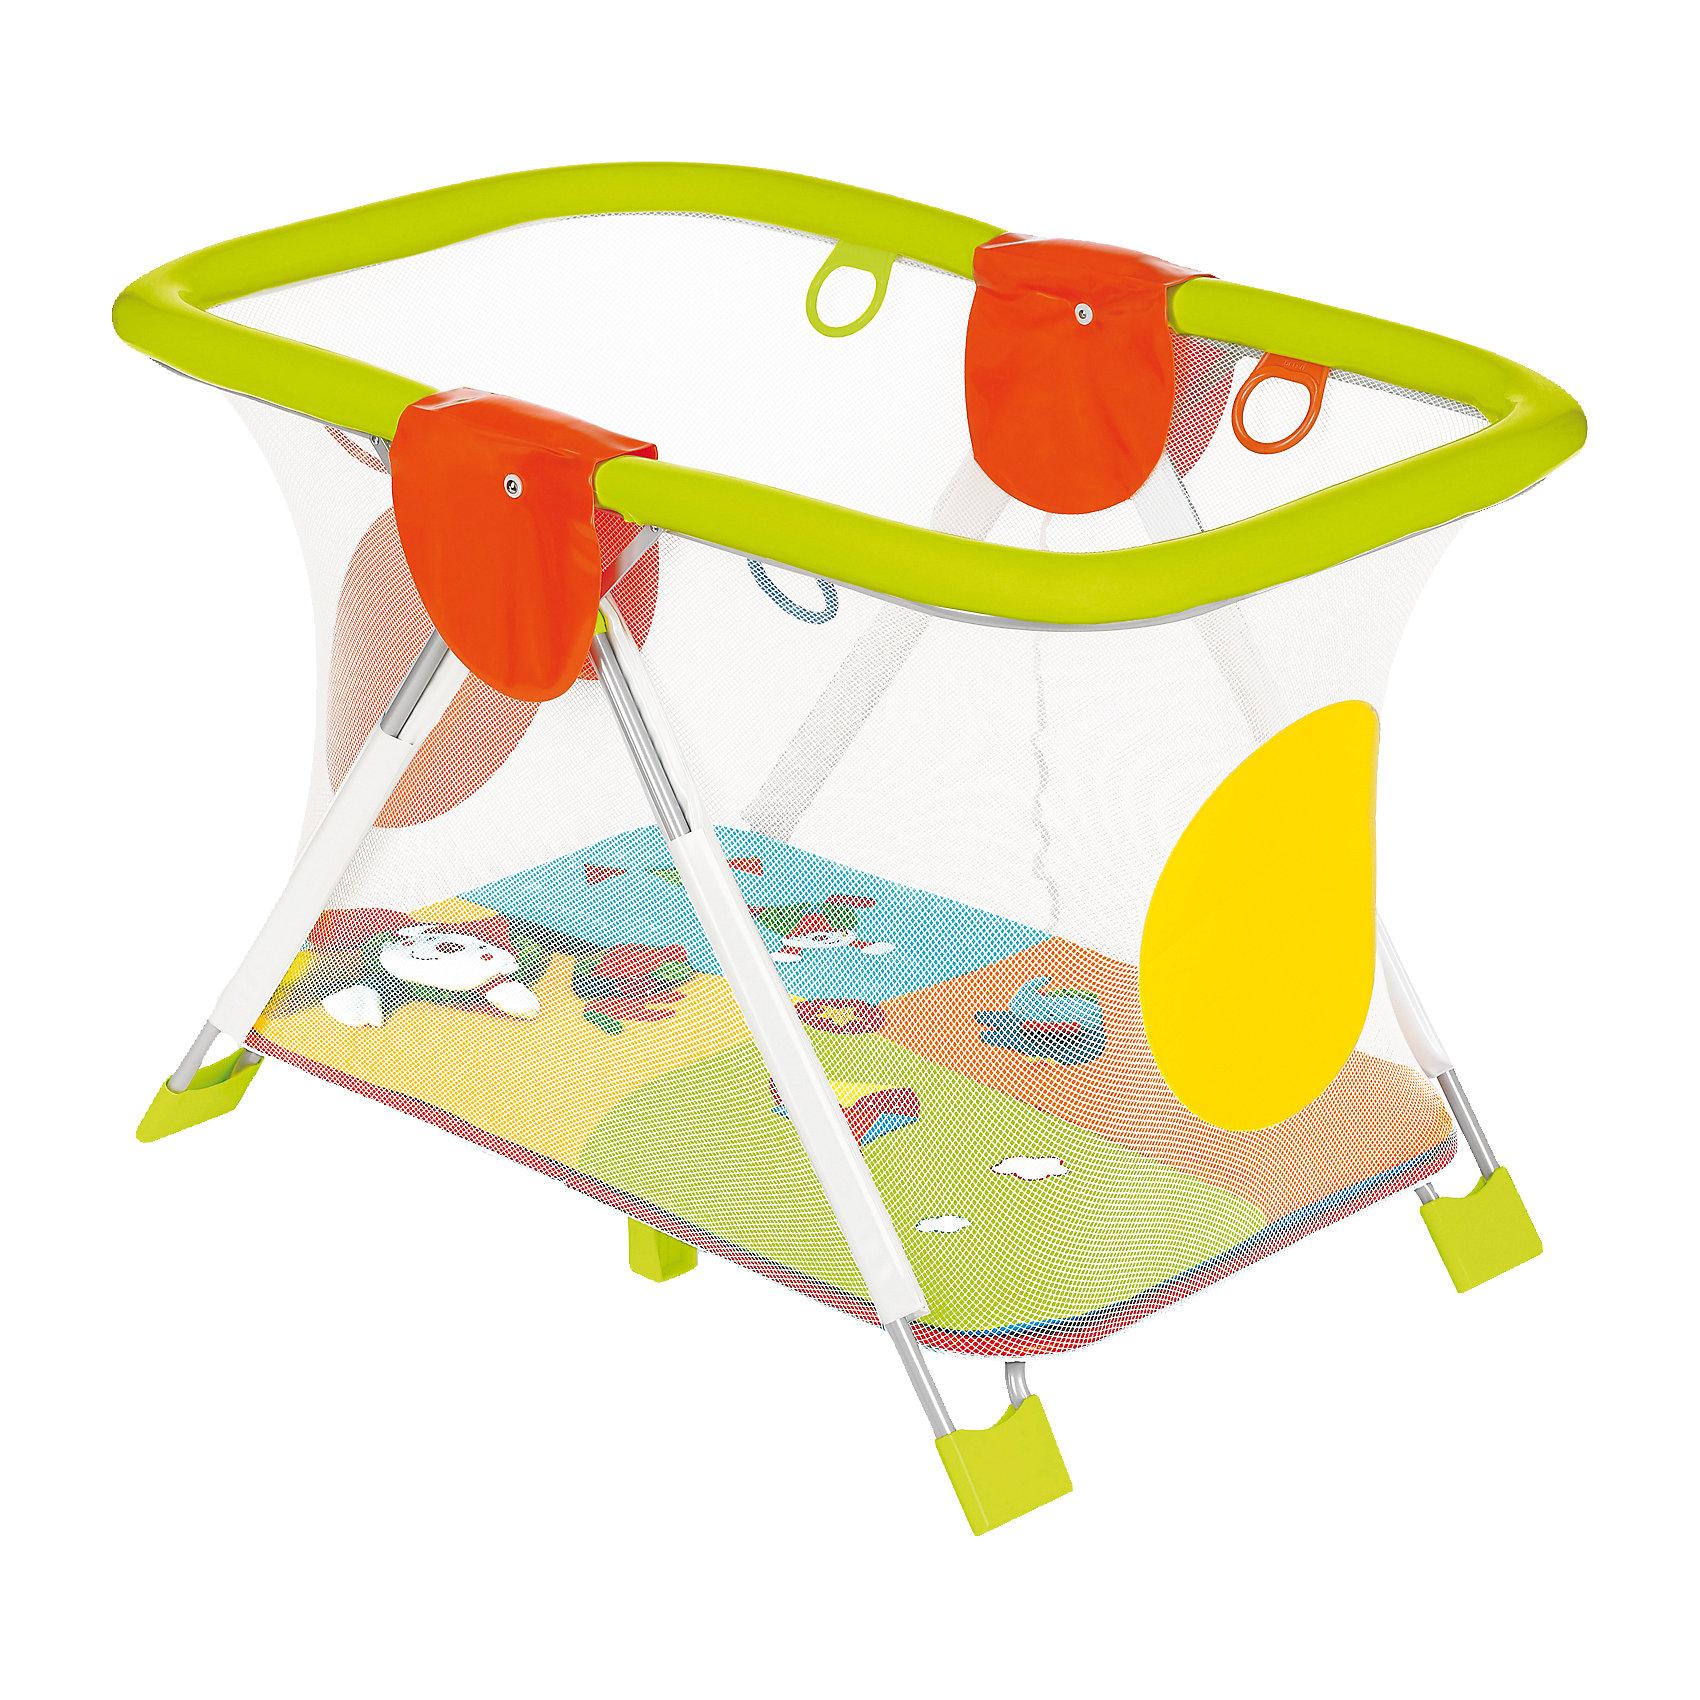 brevi Манеж Soft Play MondoCirco, Brevi манеж globex 1101 классик yellow